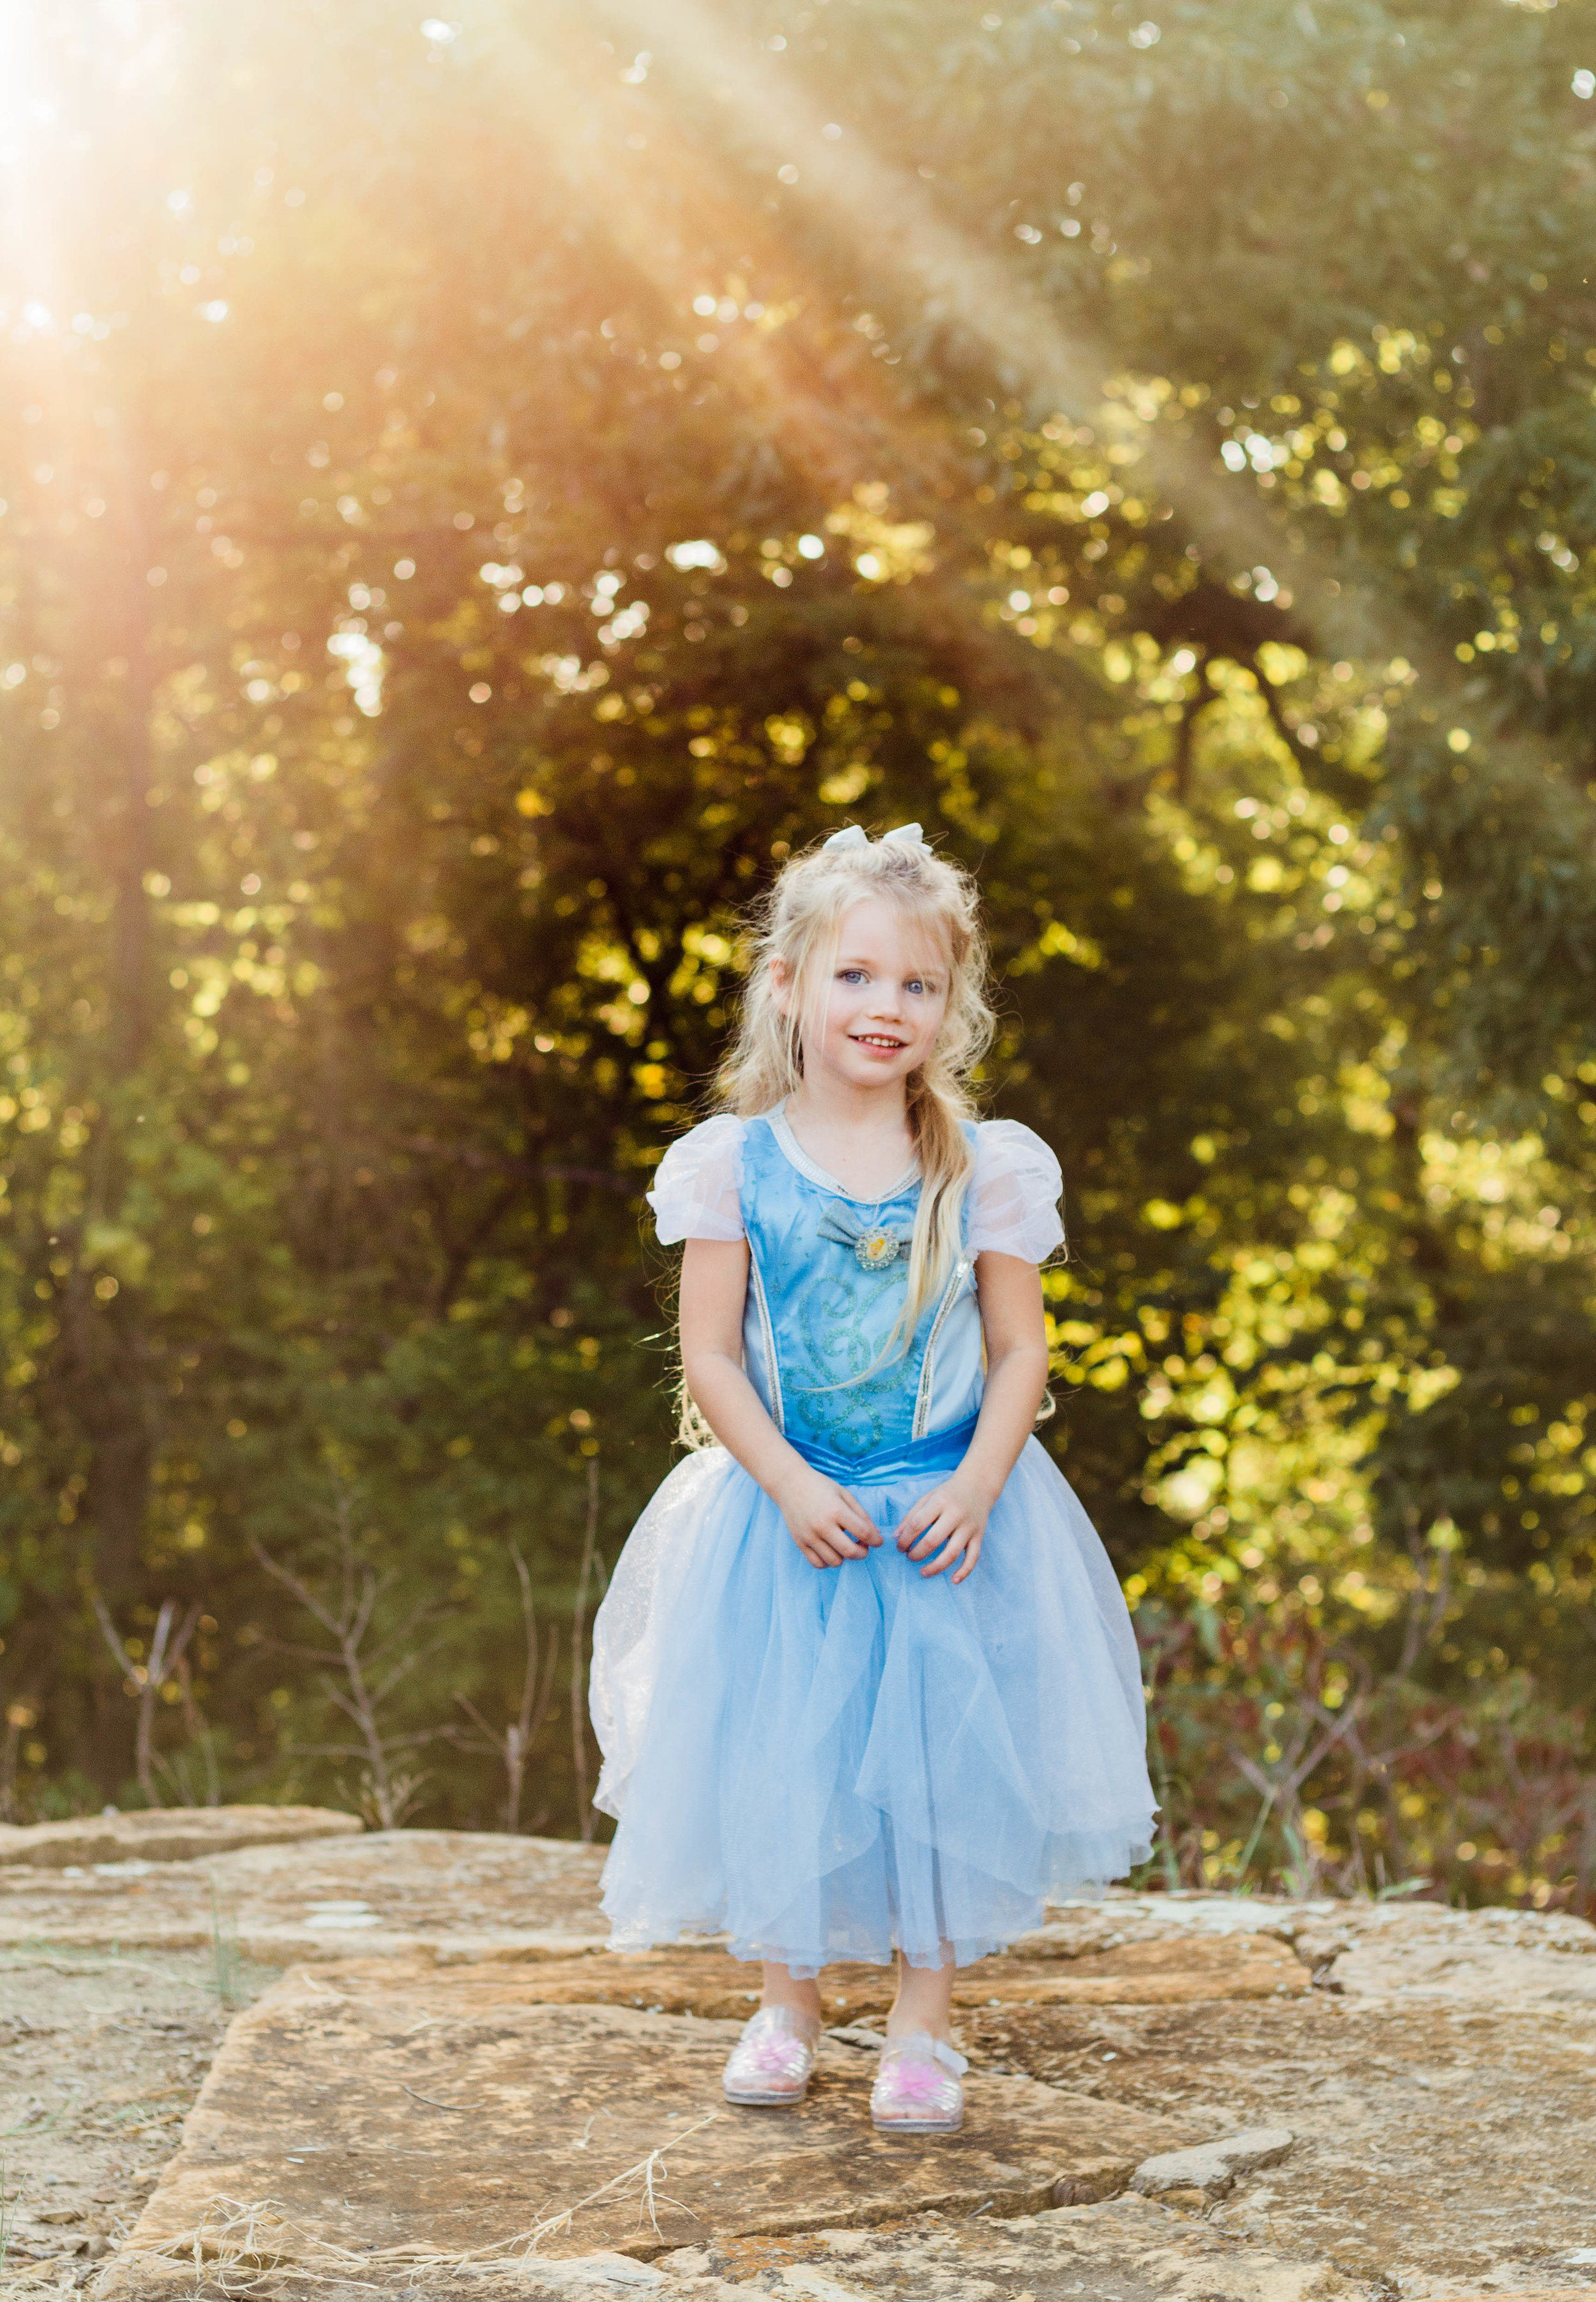 princessriley-6.jpg